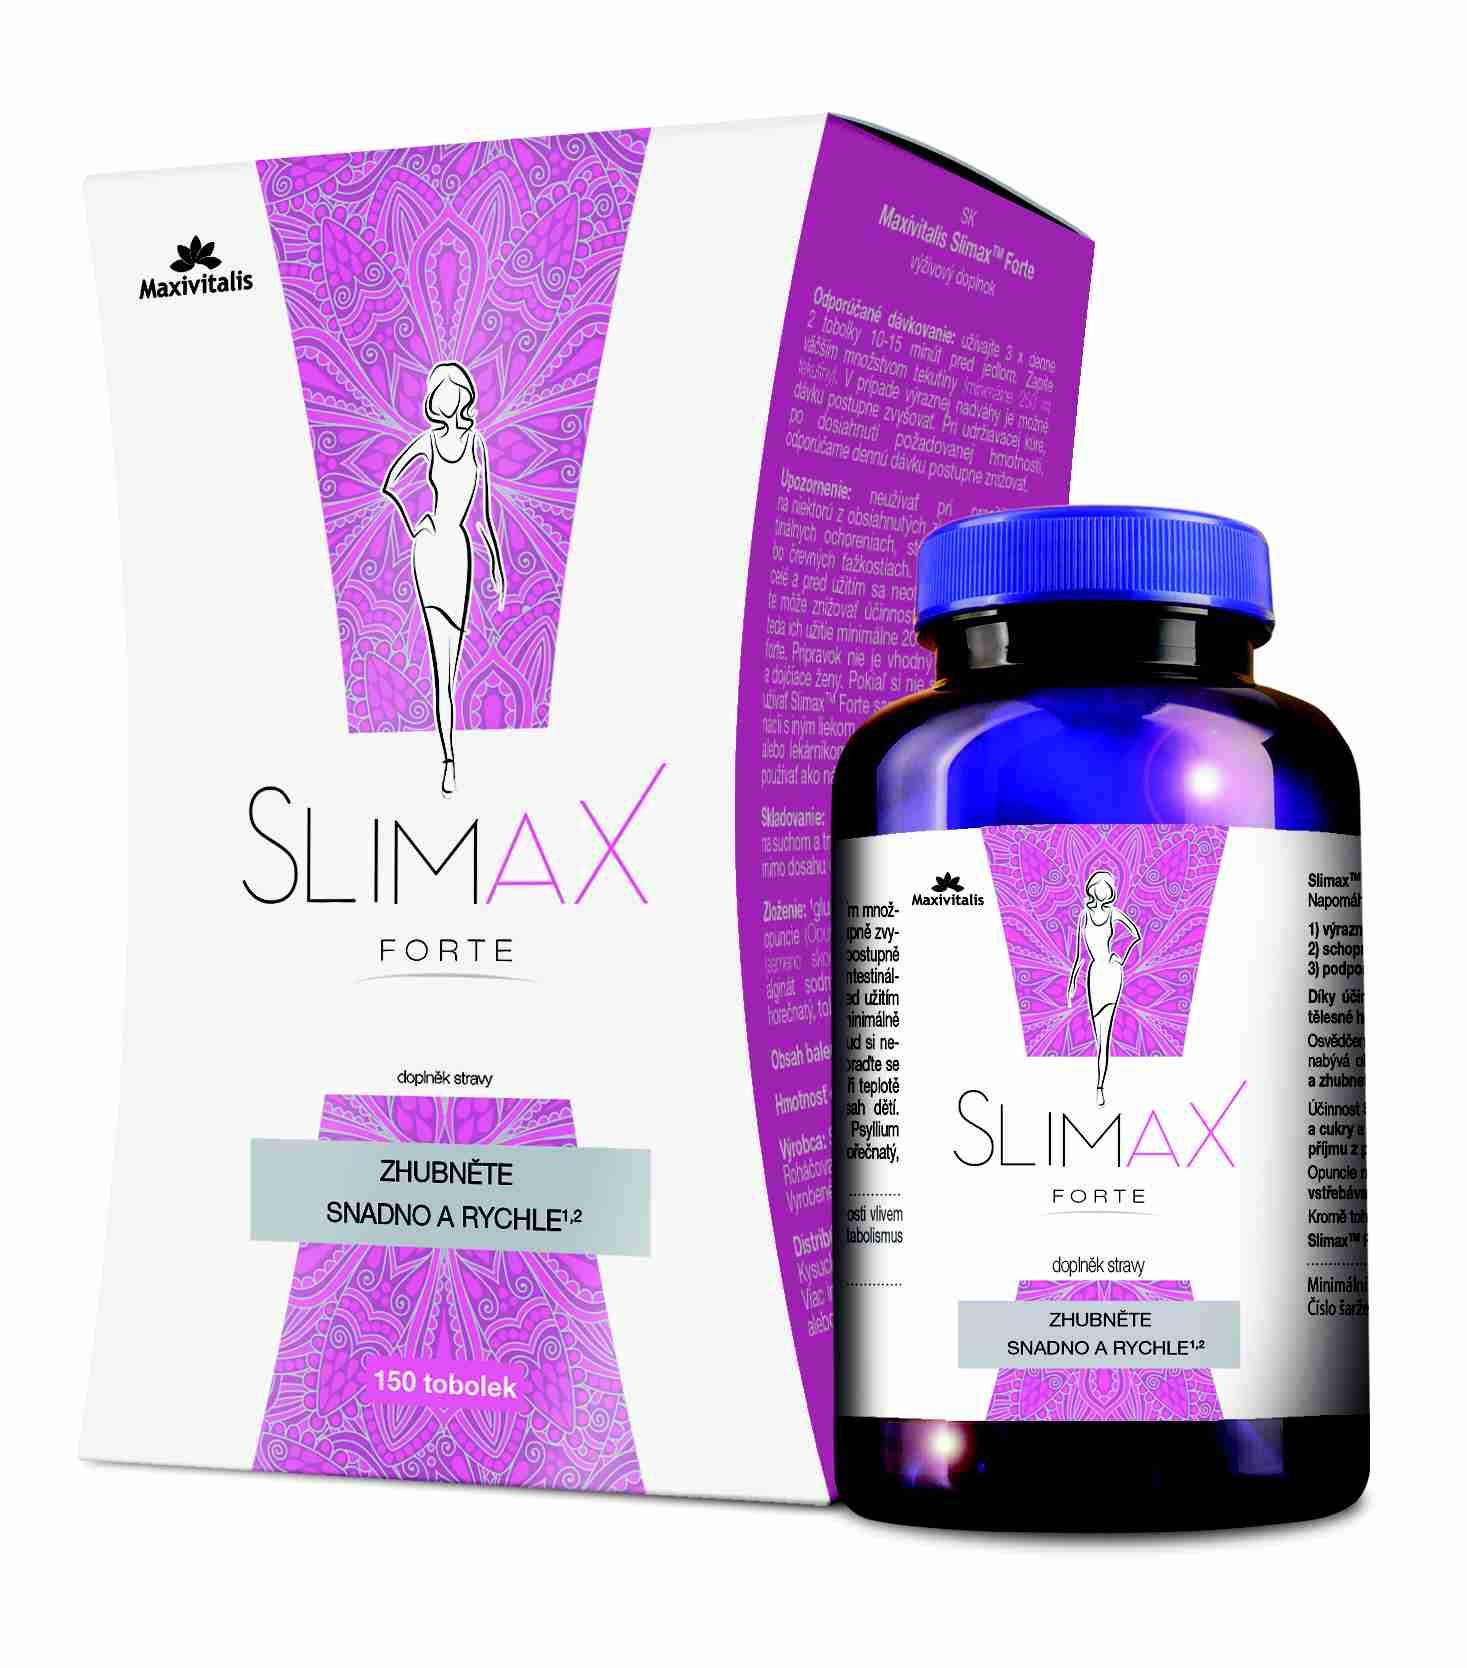 Maxivitalis Slimax Forte 150 tob.